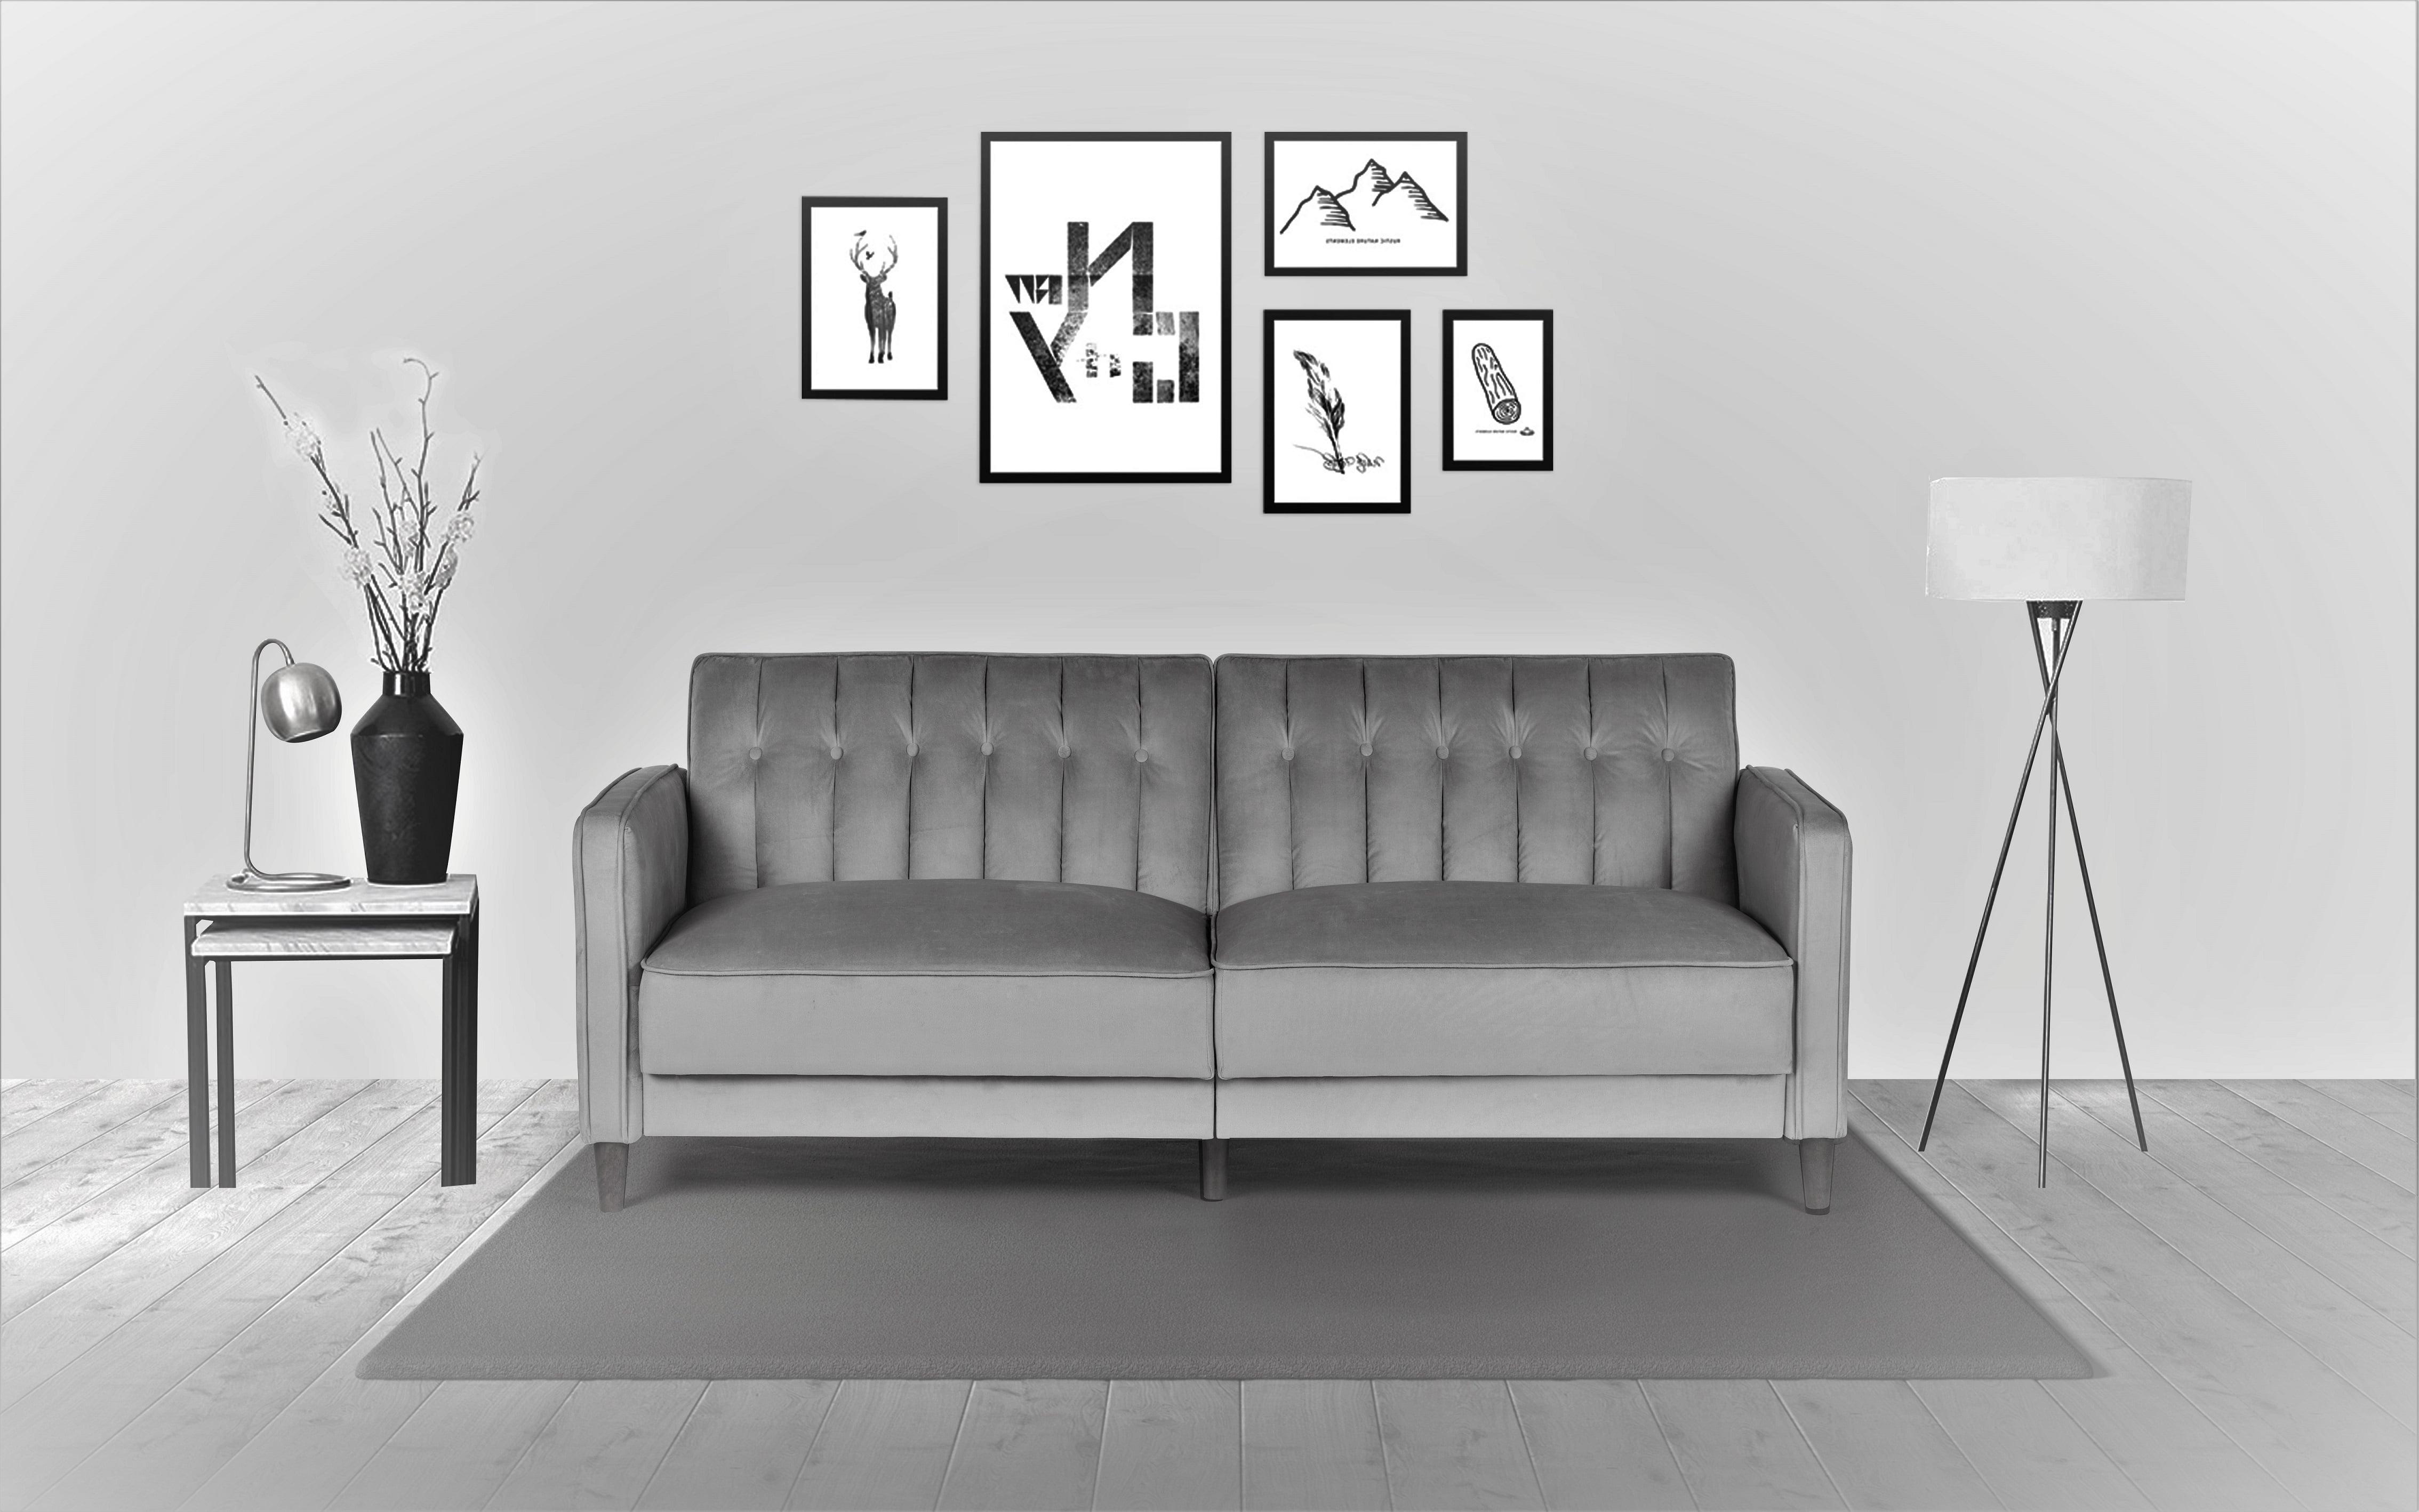 US Pride Furniture Mariposa Luxury Mid-Century Contemporary Sofa Bed  Design, Grey